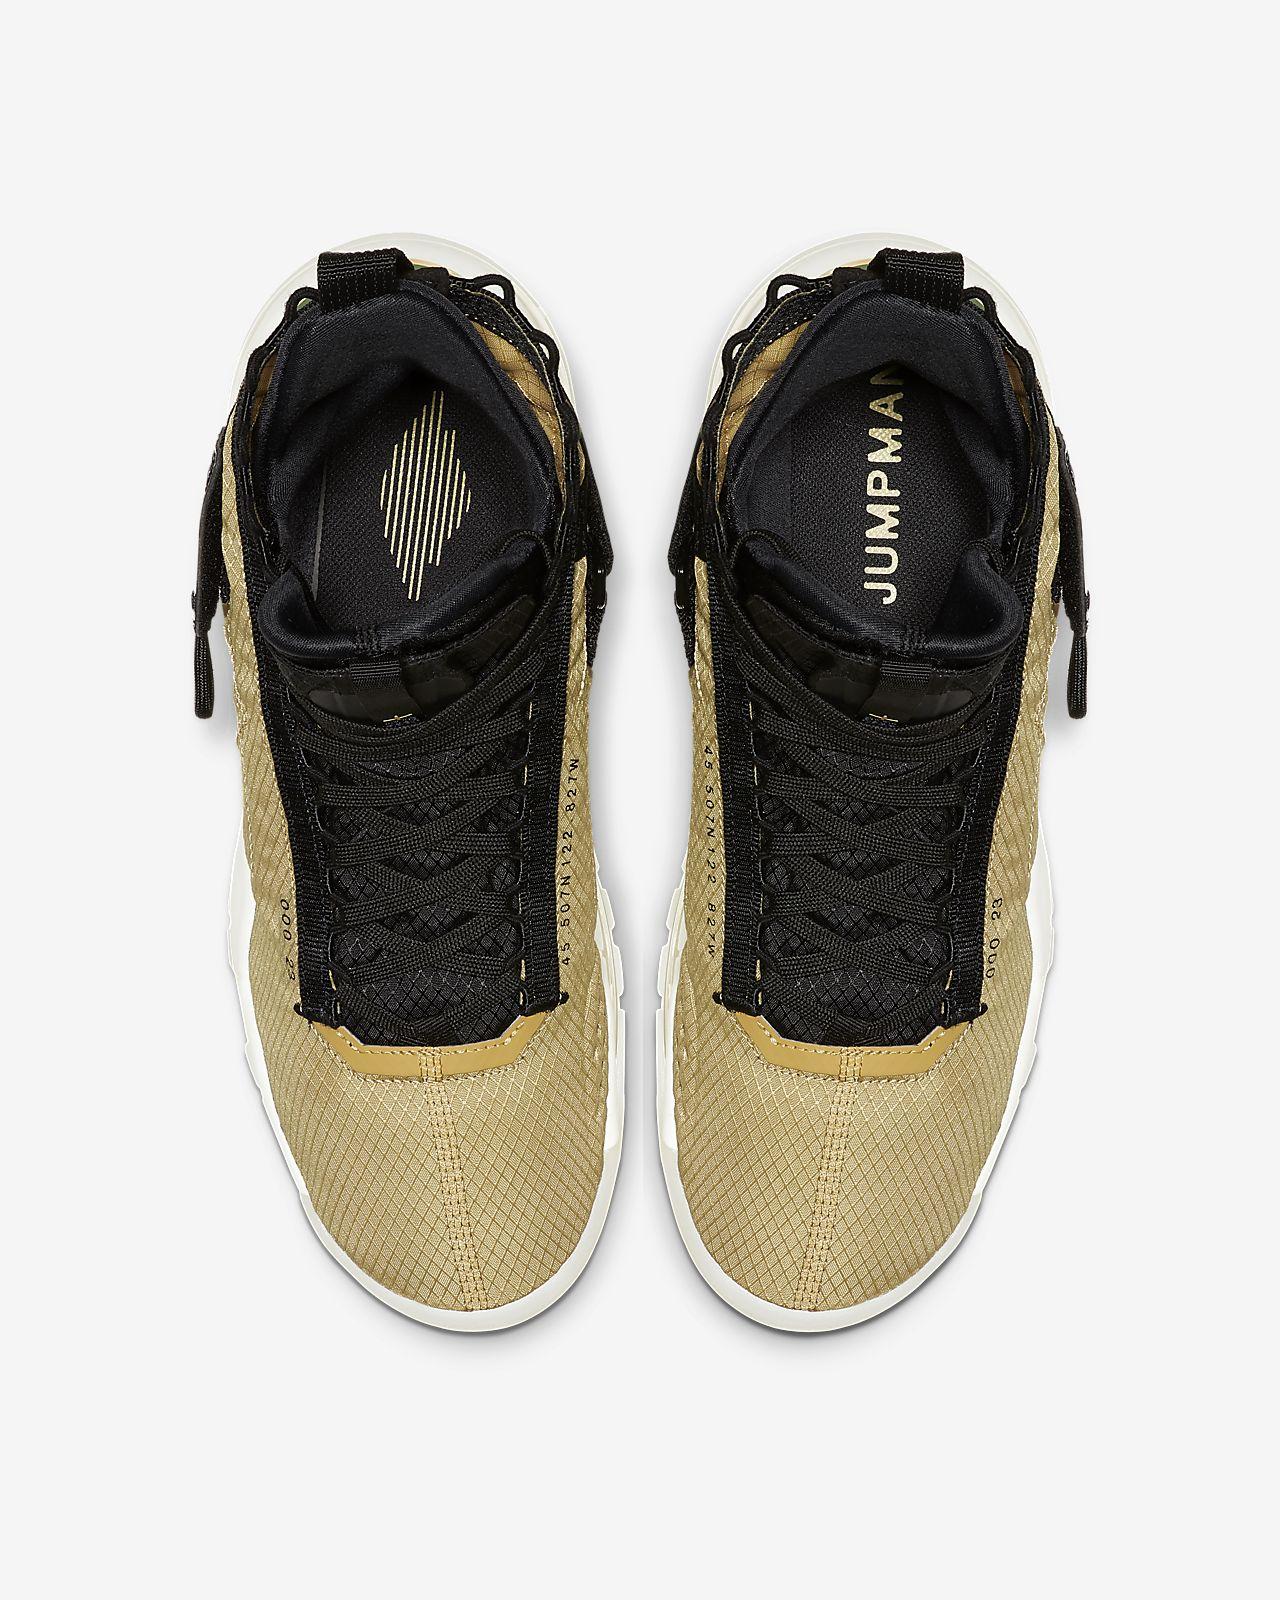 huge selection of dd6ce 772bd ... Chaussure Jordan Proto-Max 720 pour Homme